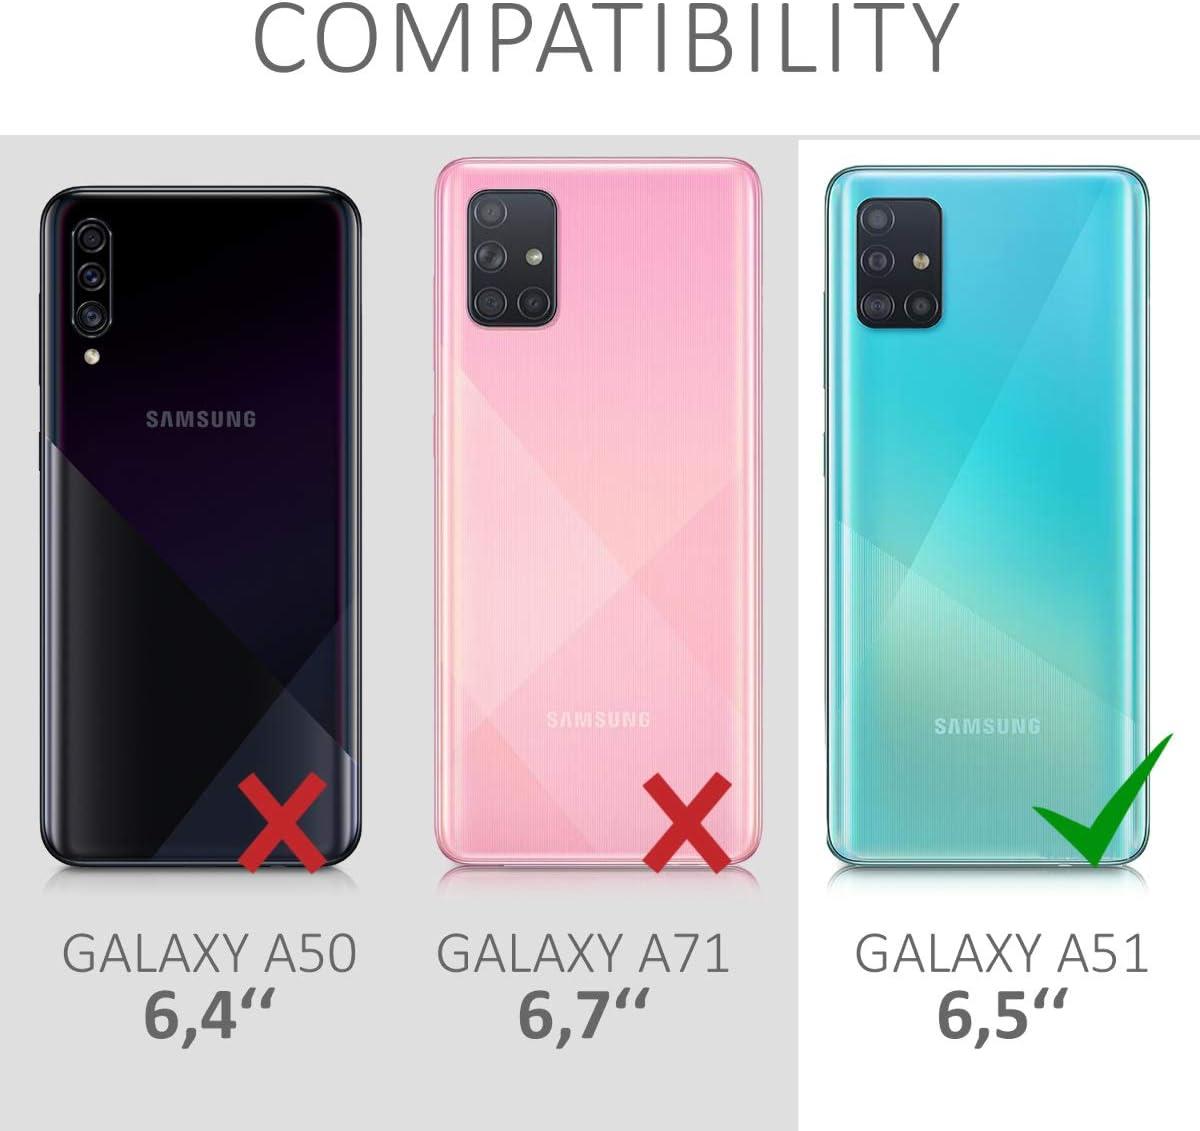 Protector Trasero en Rojo Granada Carcasa de TPU Silicona kwmobile Funda Compatible con Samsung Galaxy A51